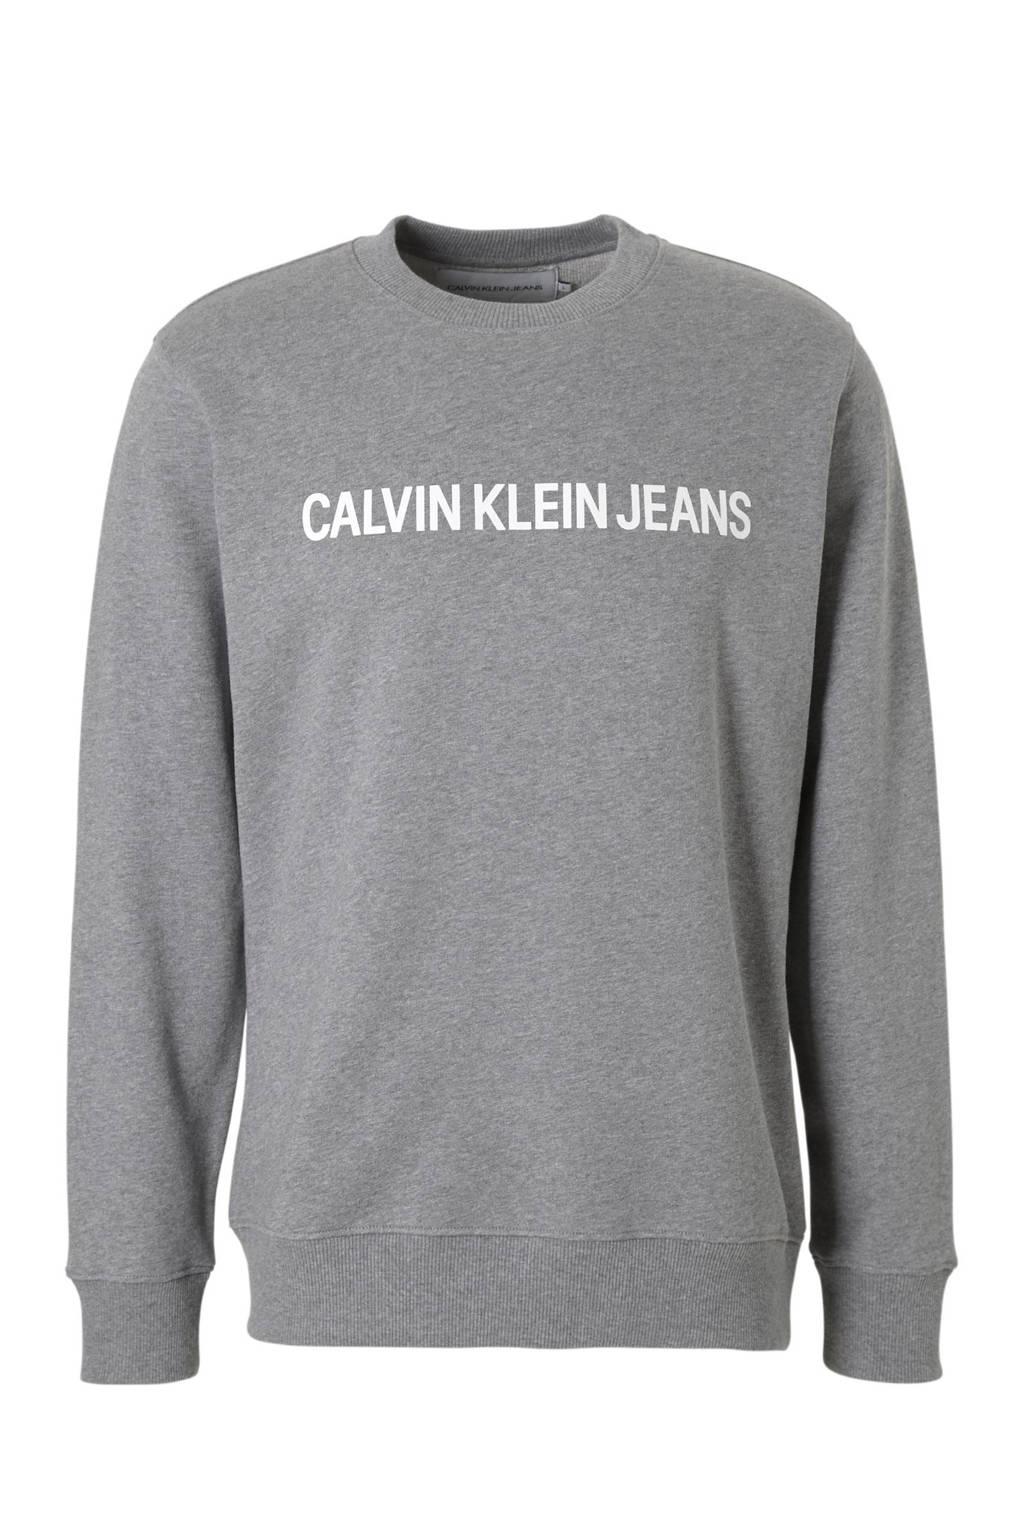 a1d8bbdcc0306a Calvin Klein Jeans sweater | wehkamp